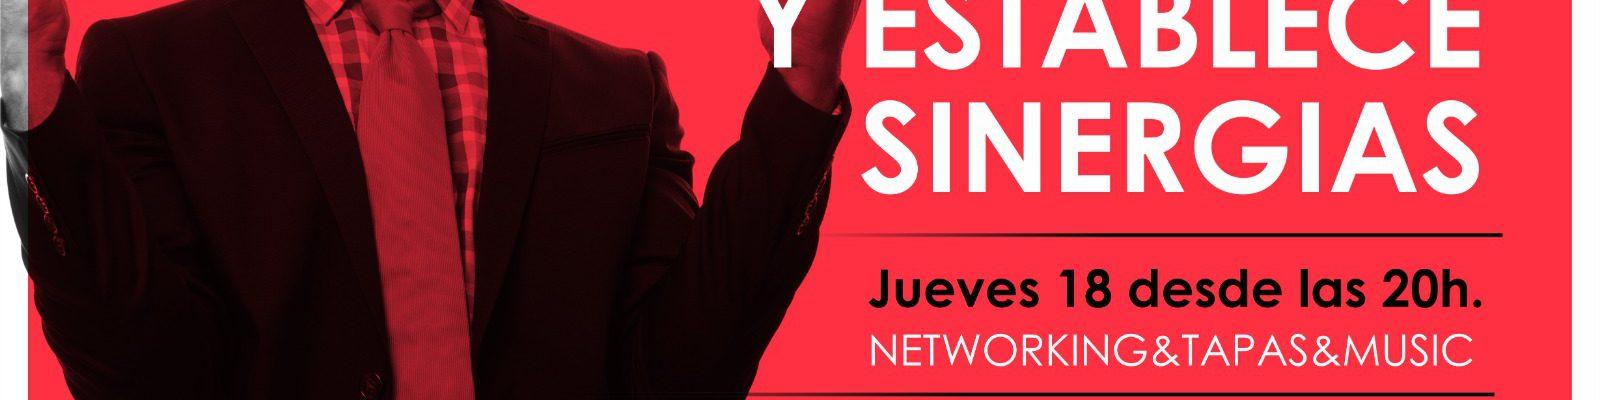 Jornada de Networking & Tapas & Music – Jueves 18 a las 20h.